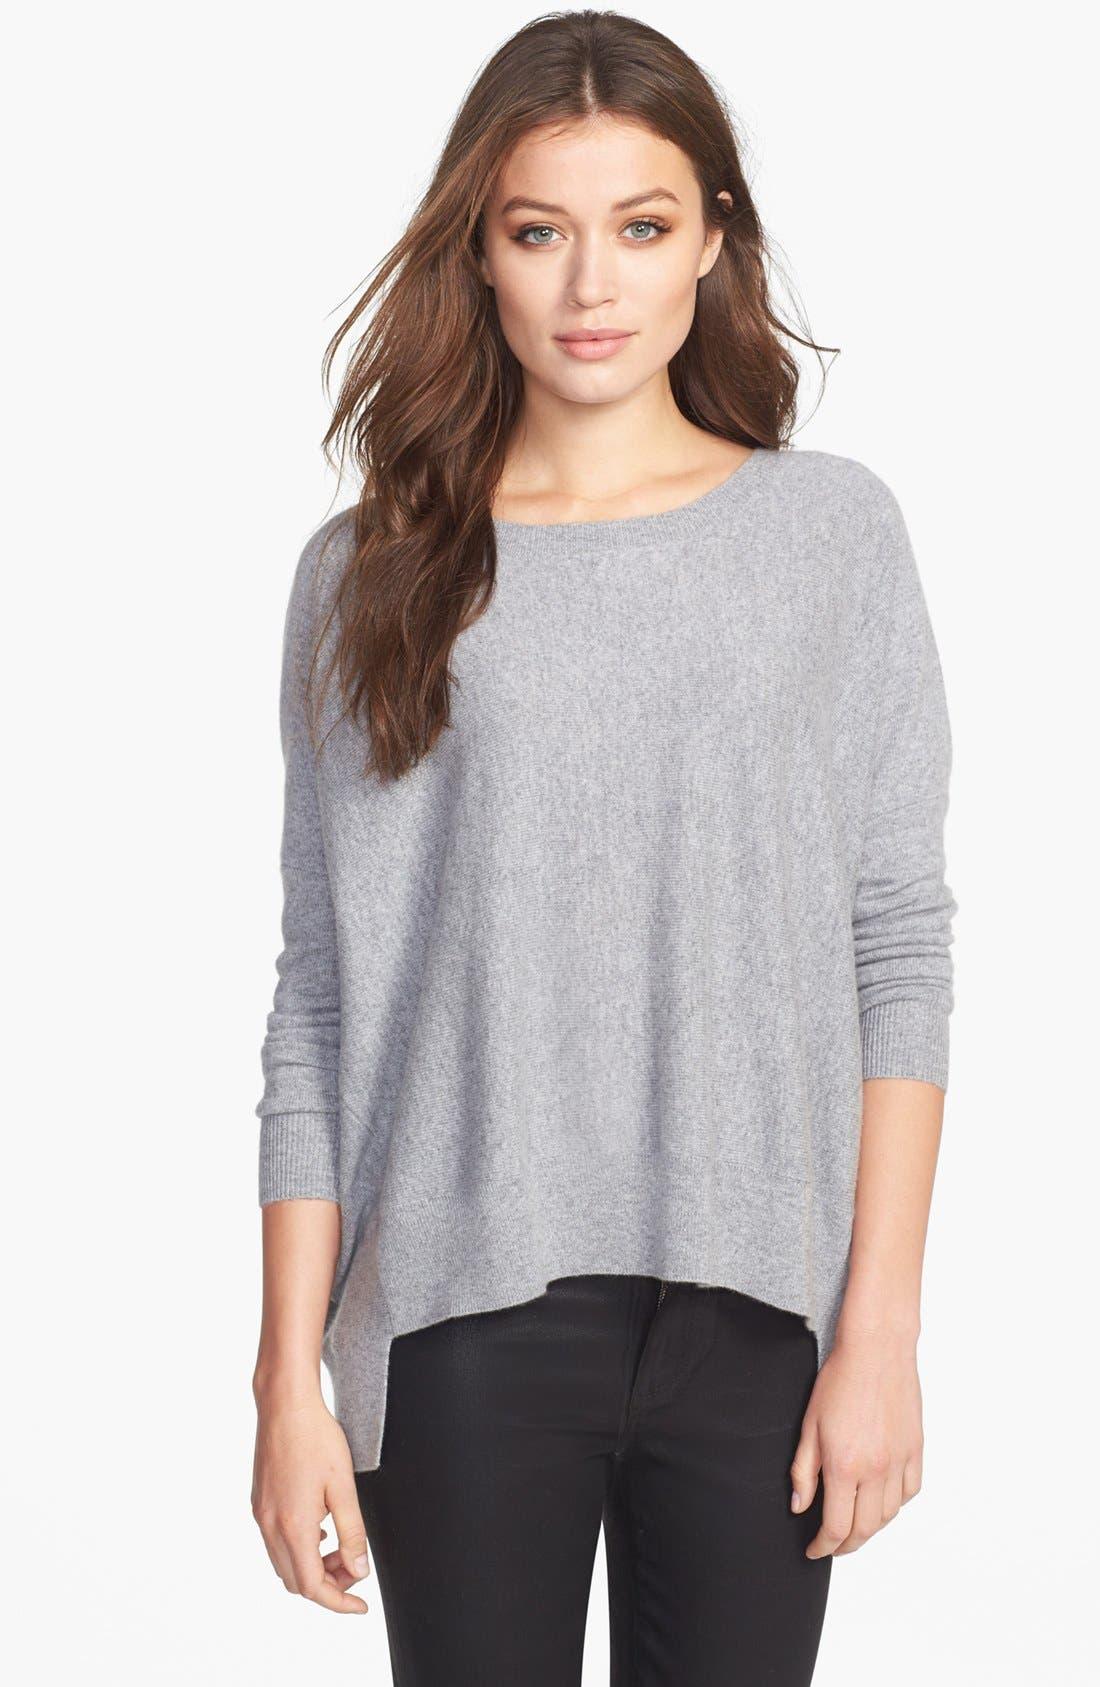 Alternate Image 1 Selected - Eileen Fisher Ballet Neck Cashmere Sweater (Regular & Petite)